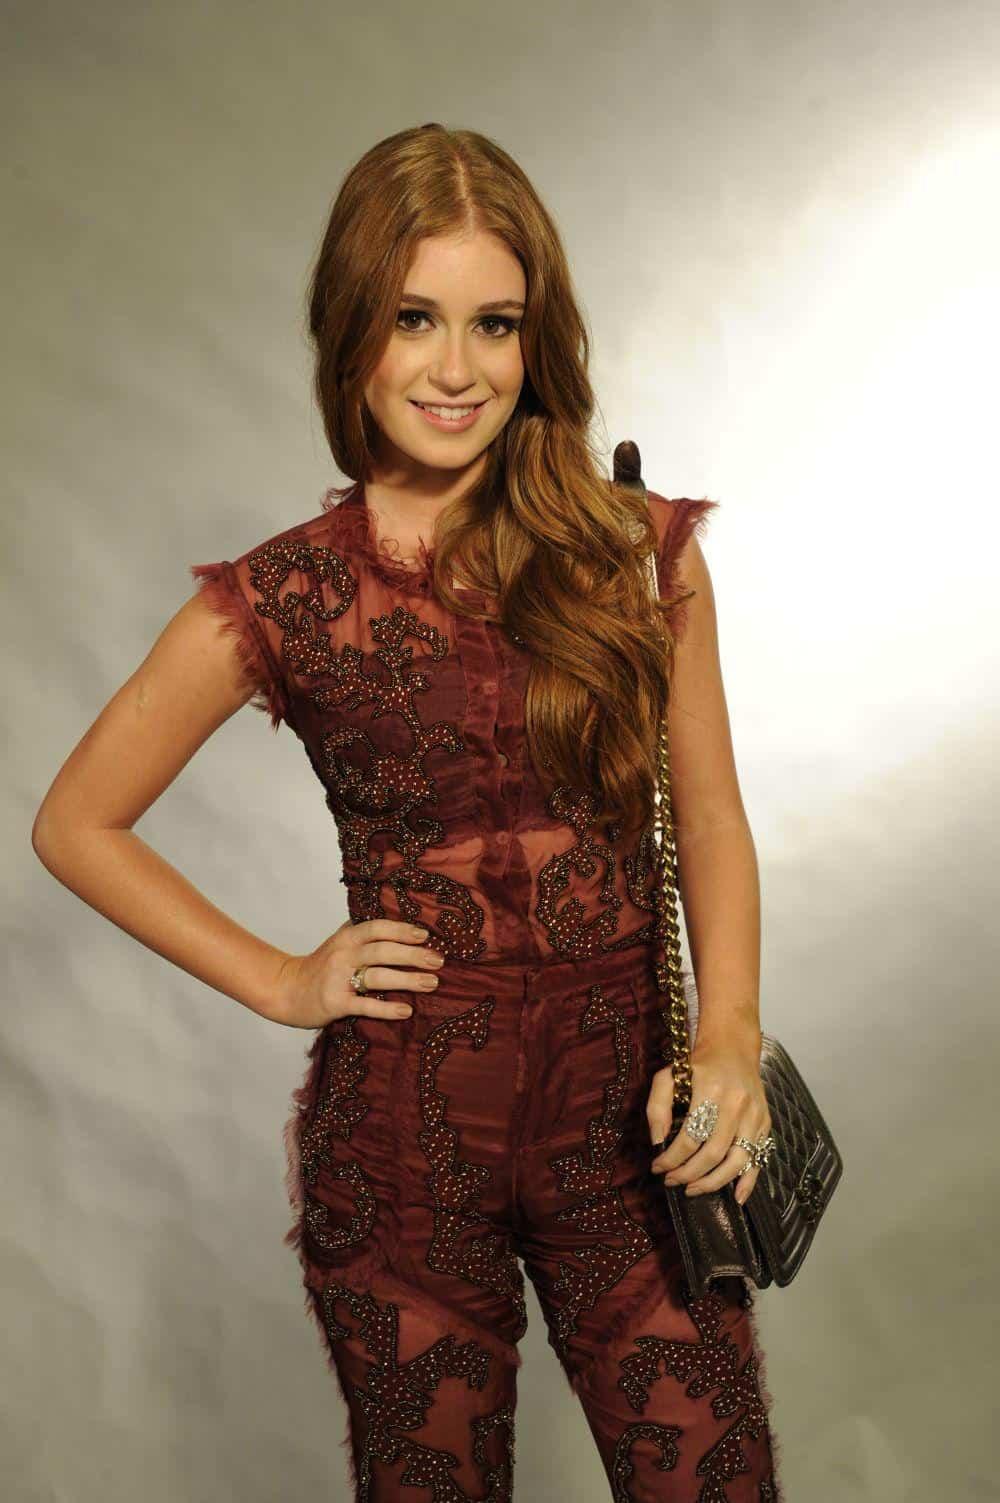 A atriz Marina Ruy Barbosa, de 18 anos